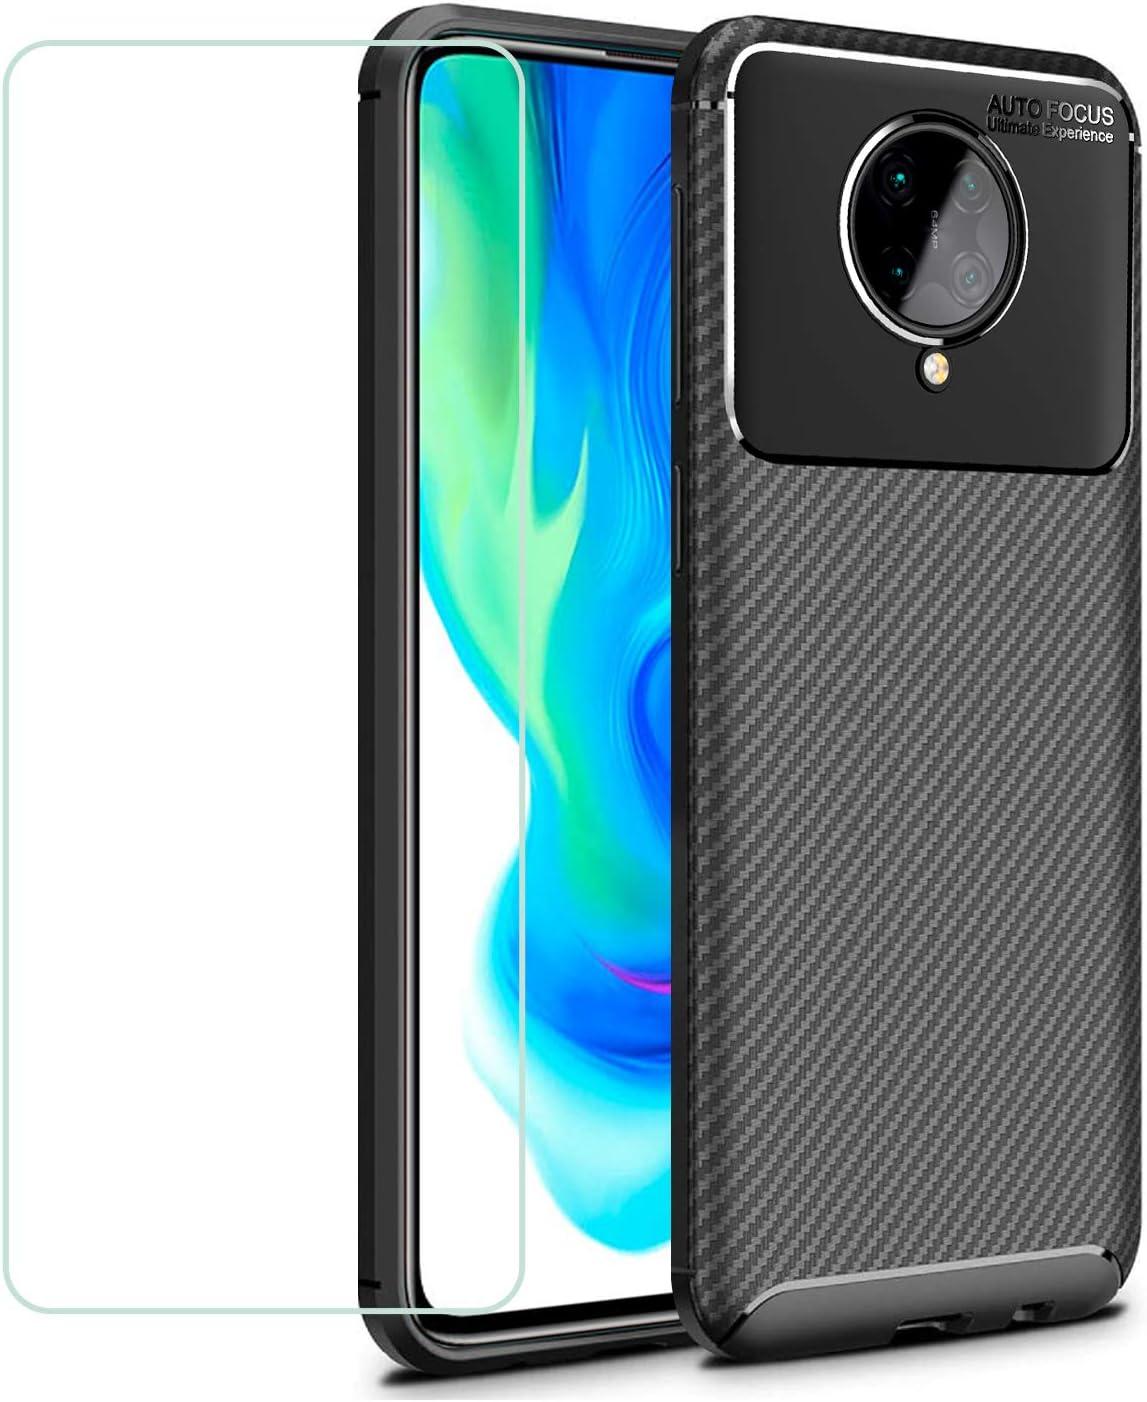 Funda Gel TPU Carbon Xiaomi Poco F2 Pro NEGRA Diseño Fibra Carbono Protector